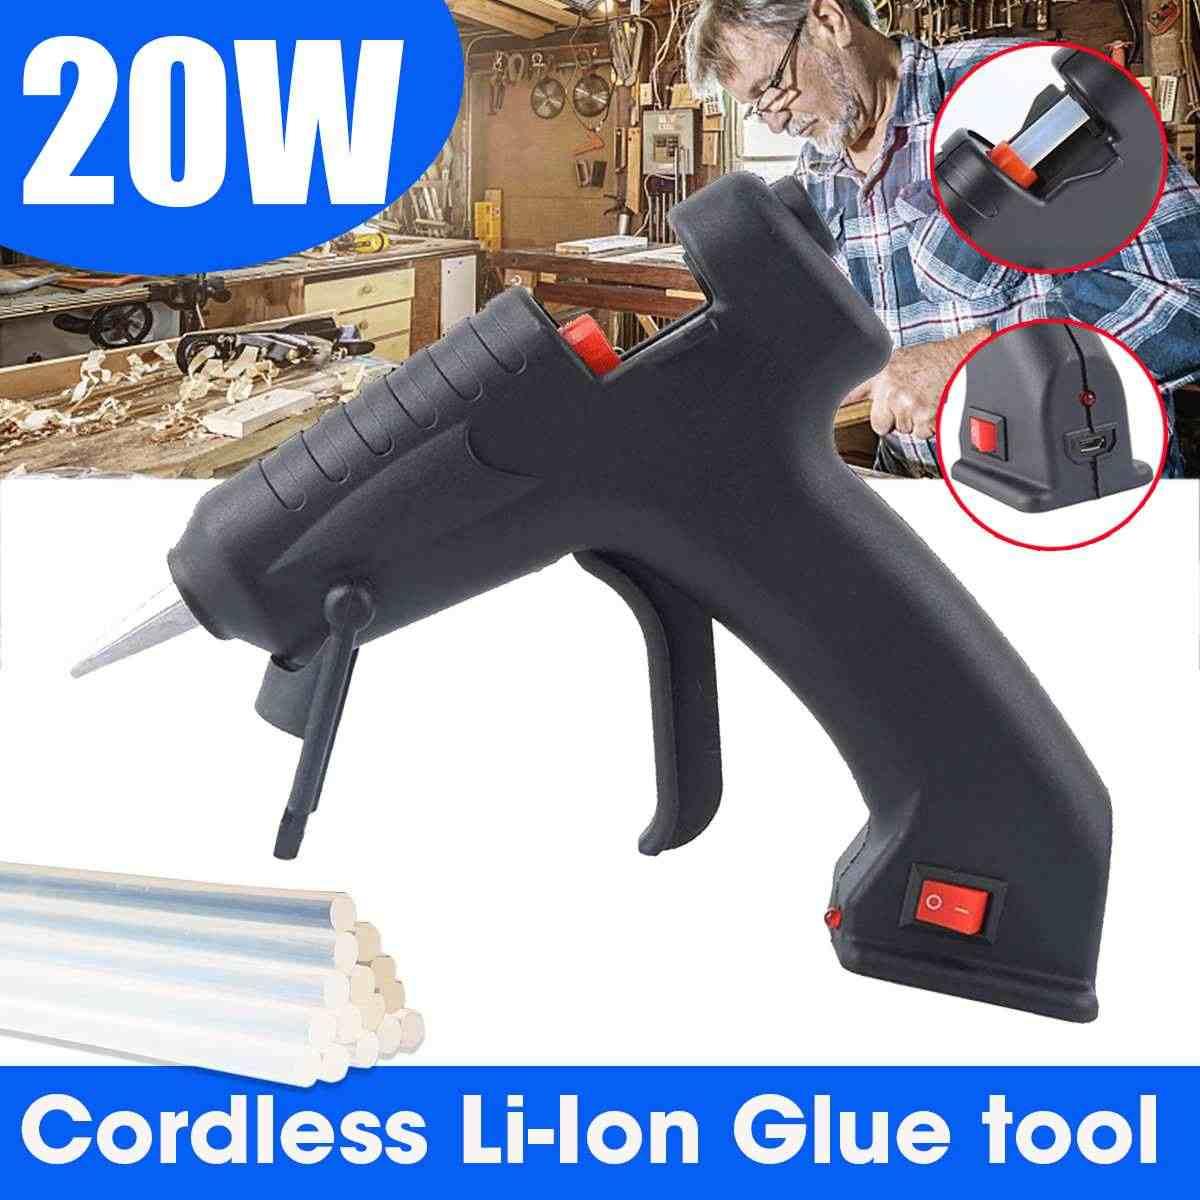 20W Hot Melt กาวปืน 7 มม.* 200 มม.กาวกาว DIY Thermo MINI กาวไร้สาย Li-Ion กาวปืนซ่อมเครื่องมือความร้อน 110V-240V